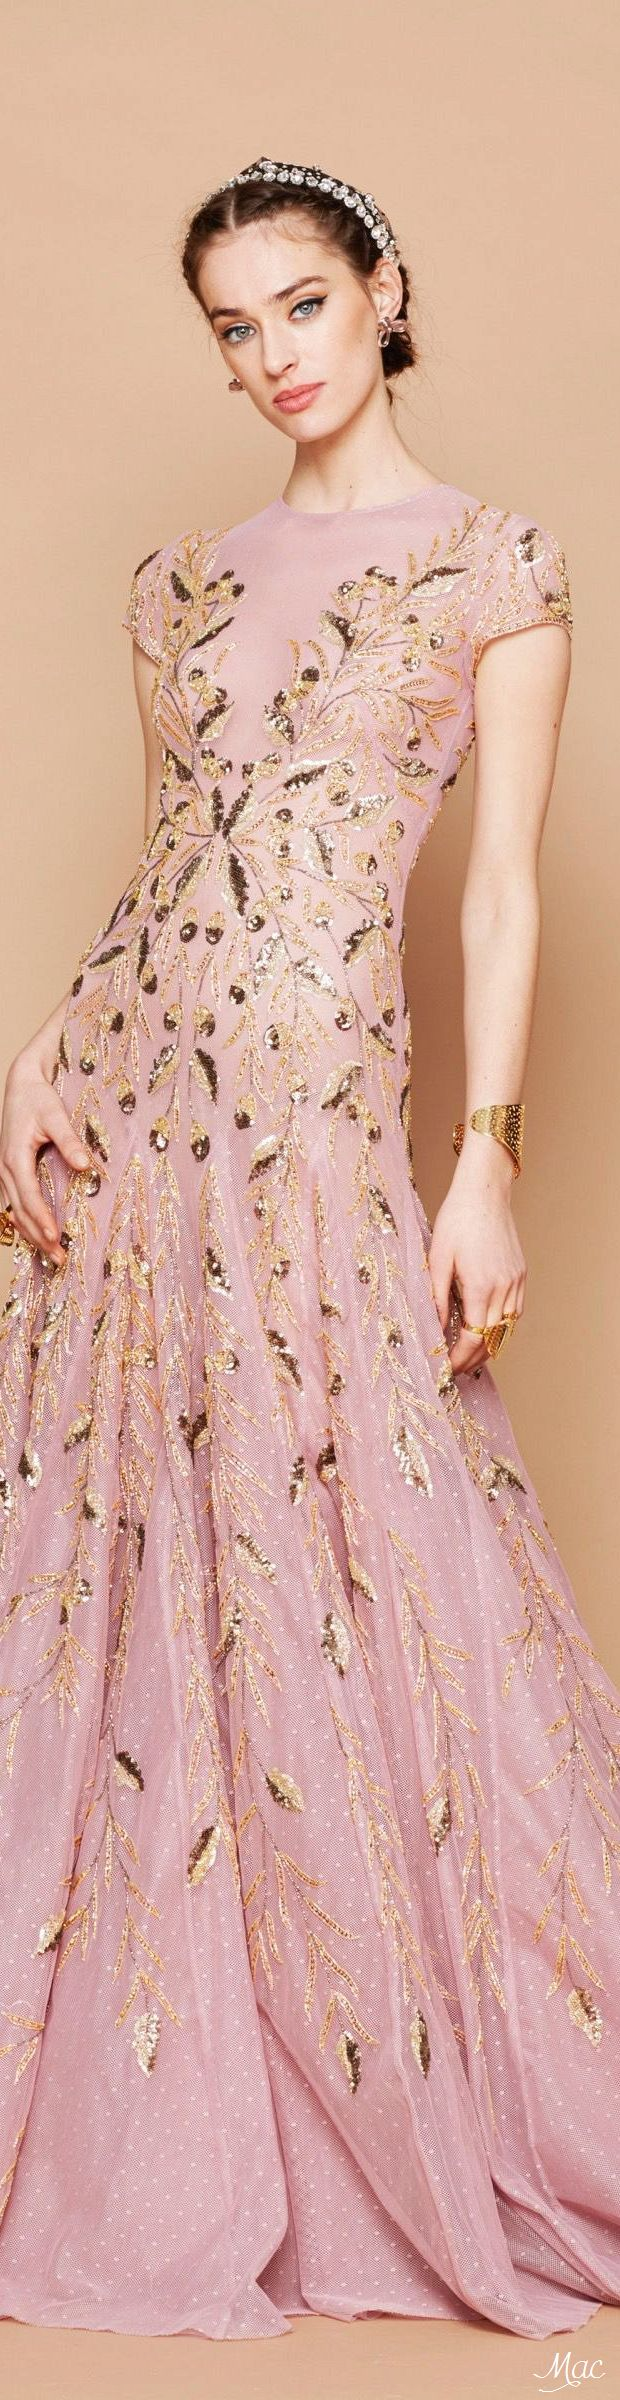 90 best Beautiful fashion photography images on Pinterest | Fashion ...